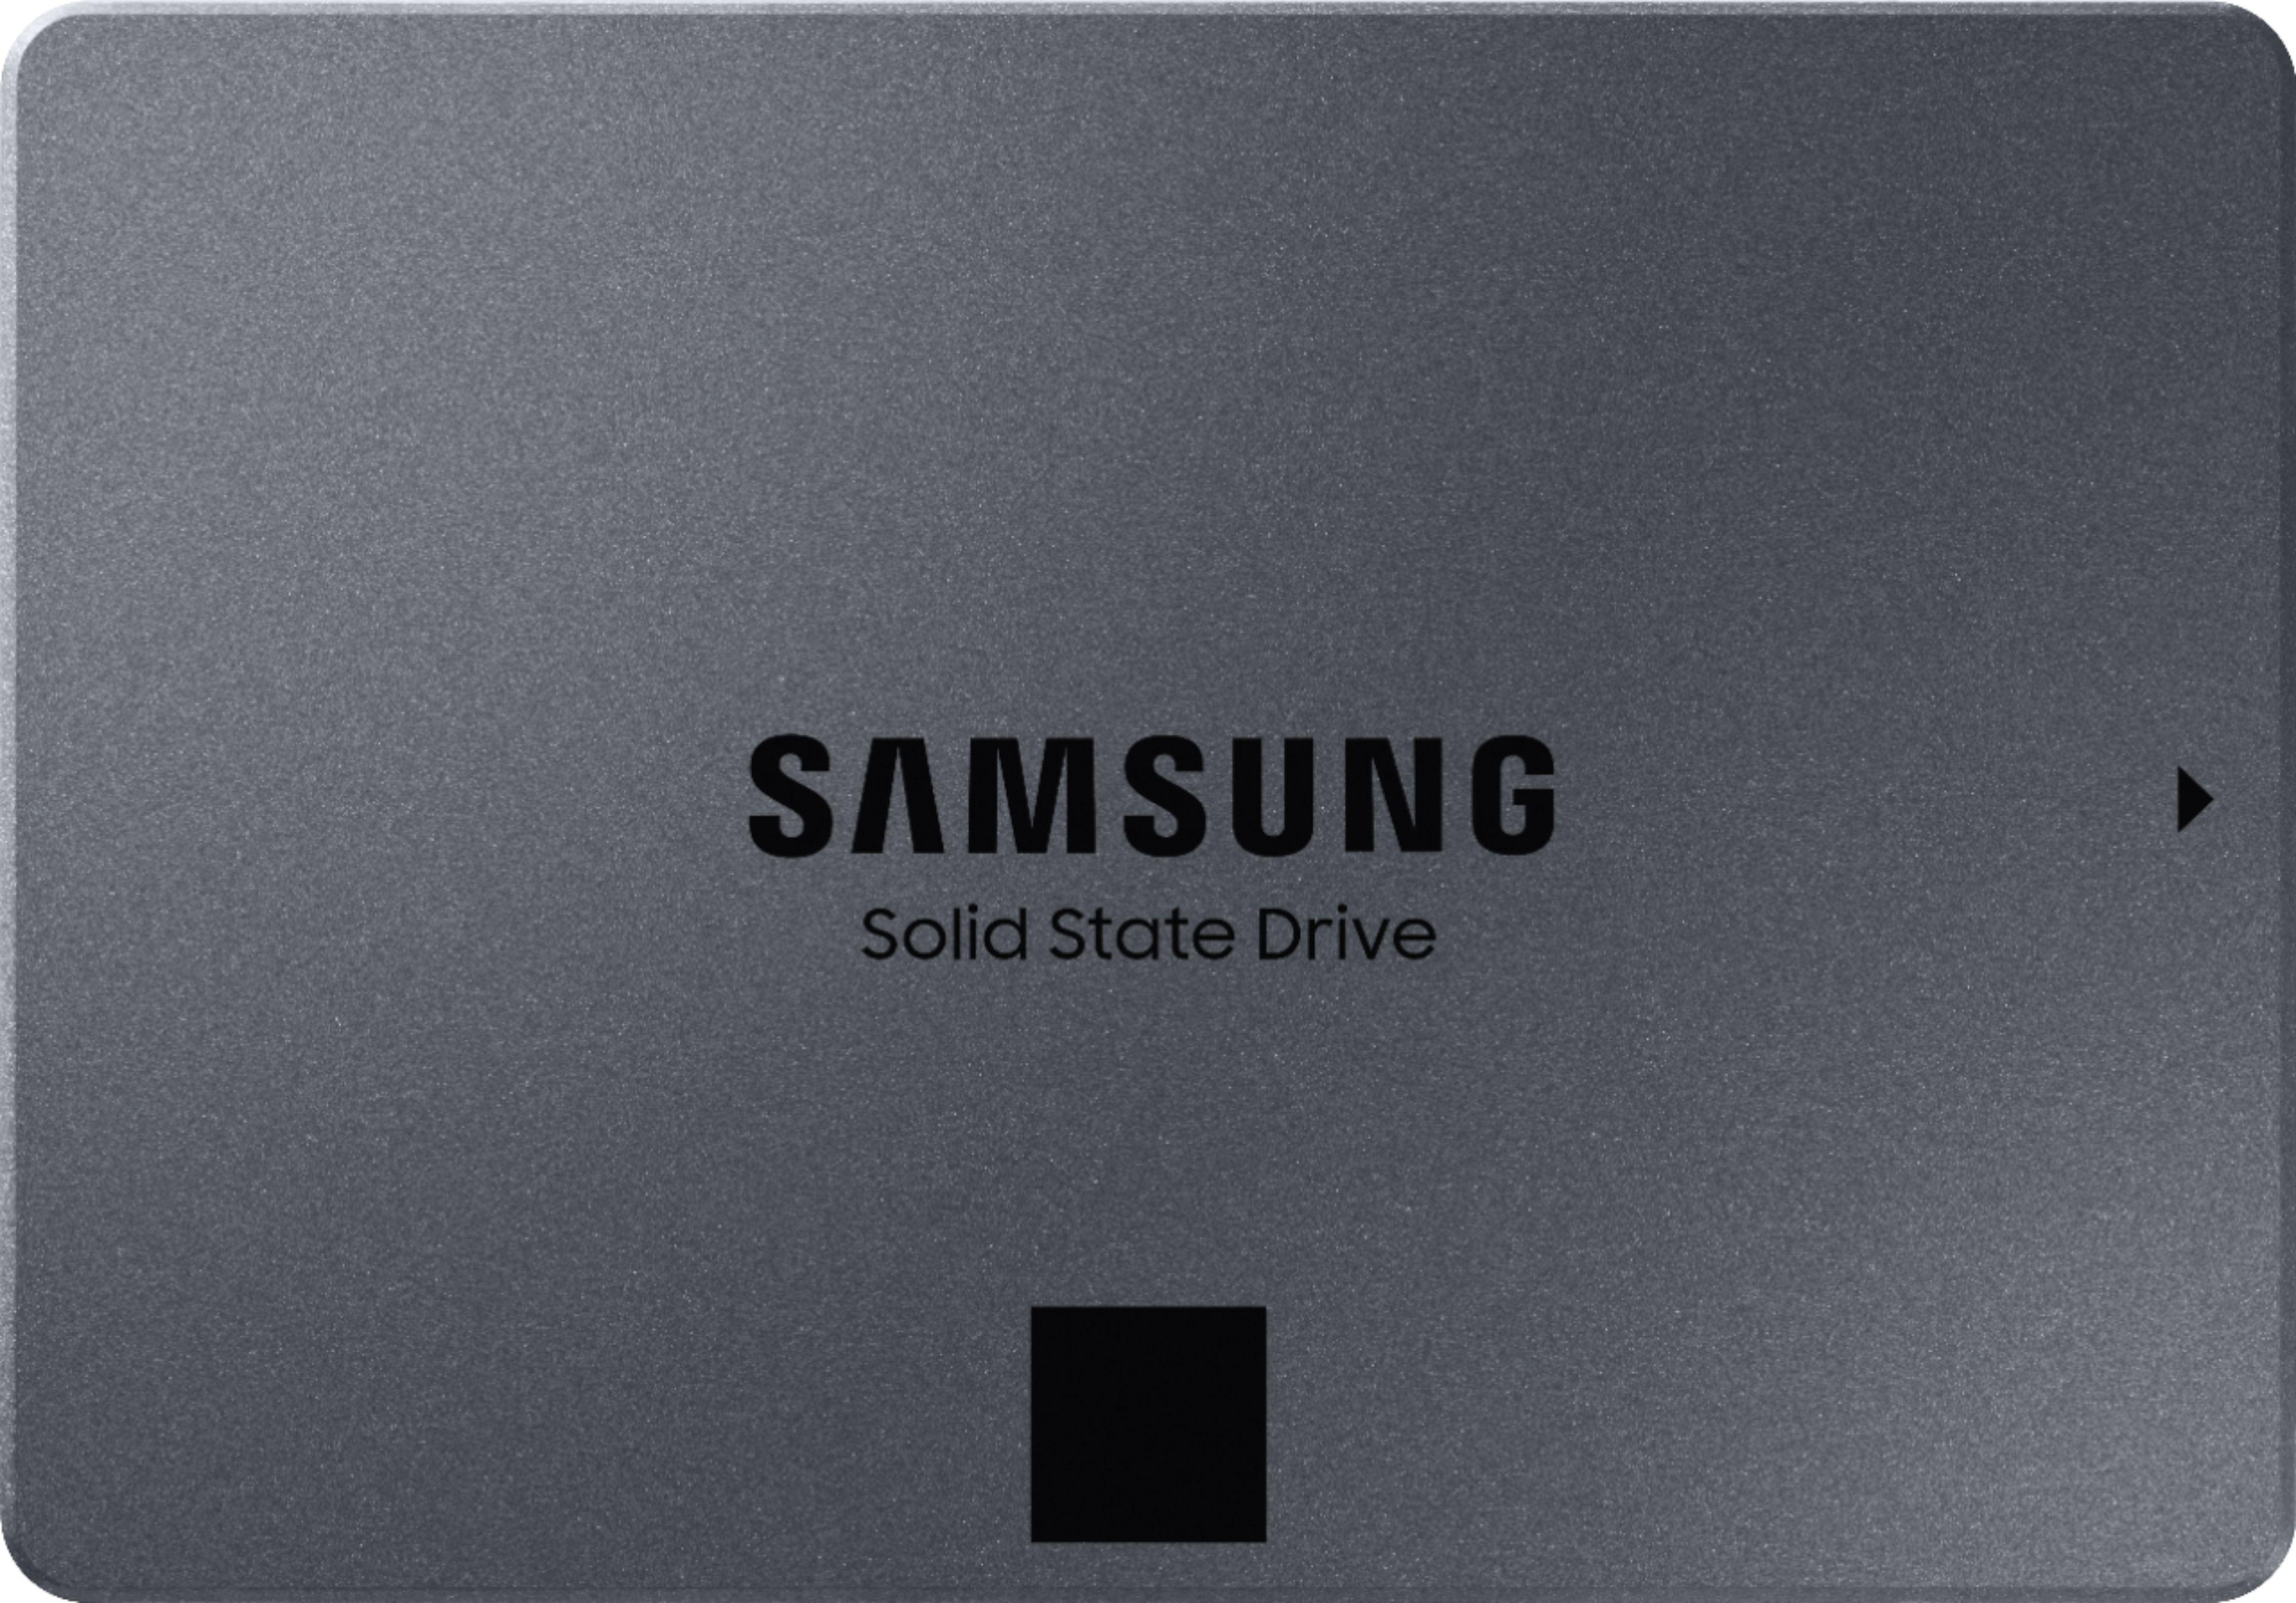 Samsung - 860 QVO 1TB Internal SATA SSD $89.99